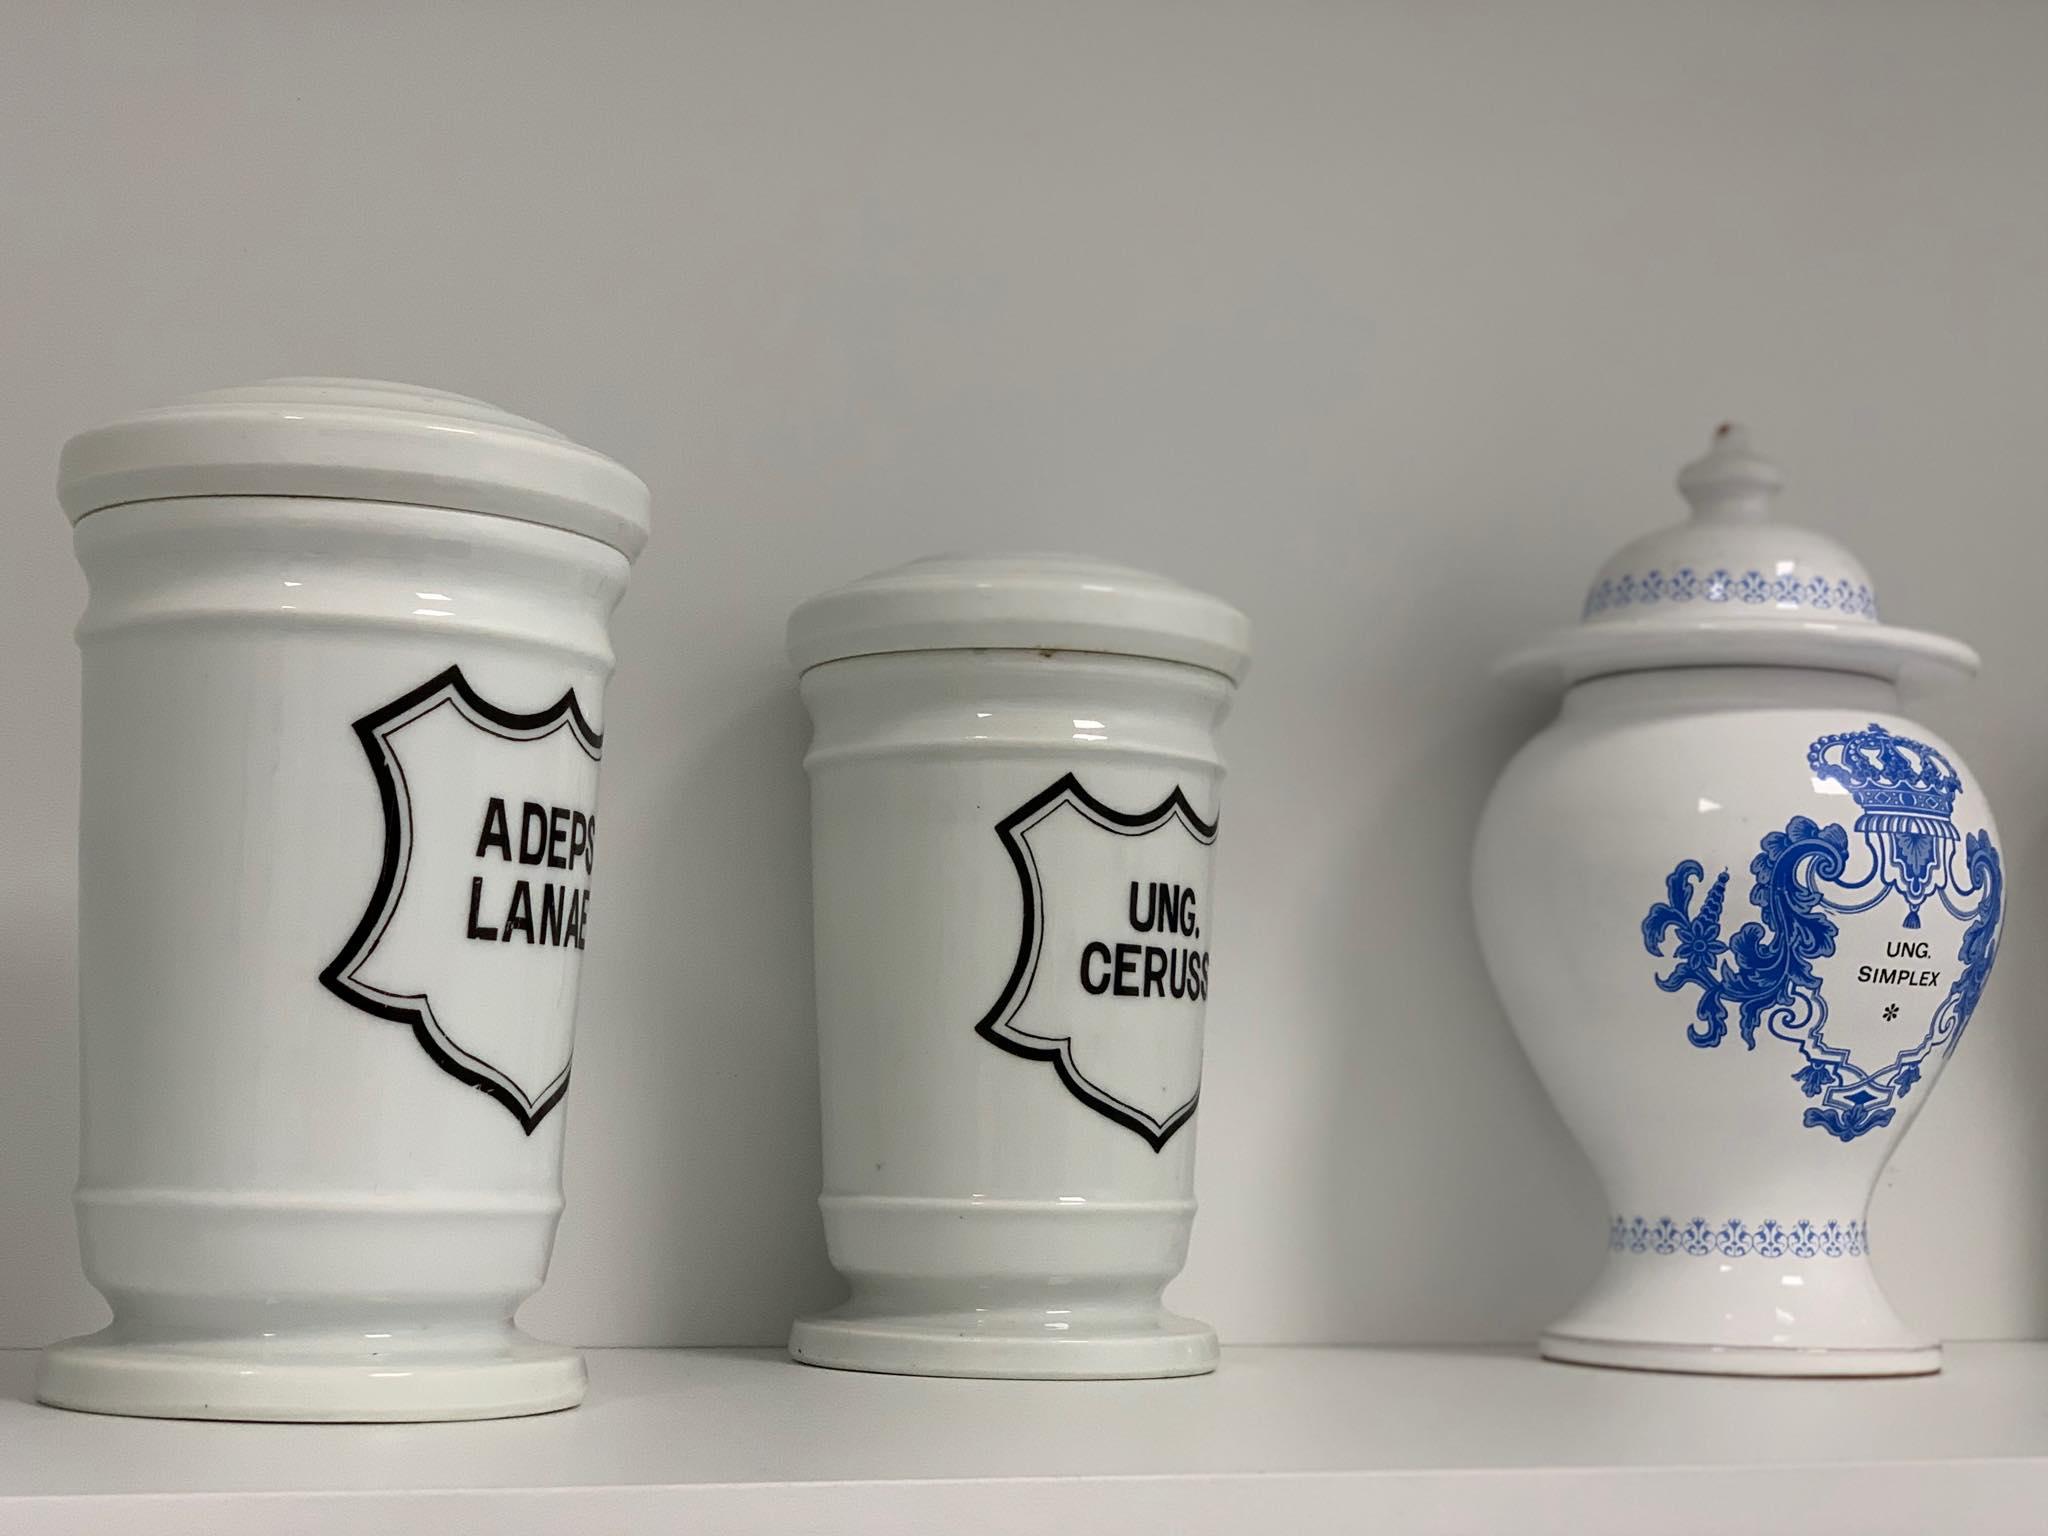 jars of drugs